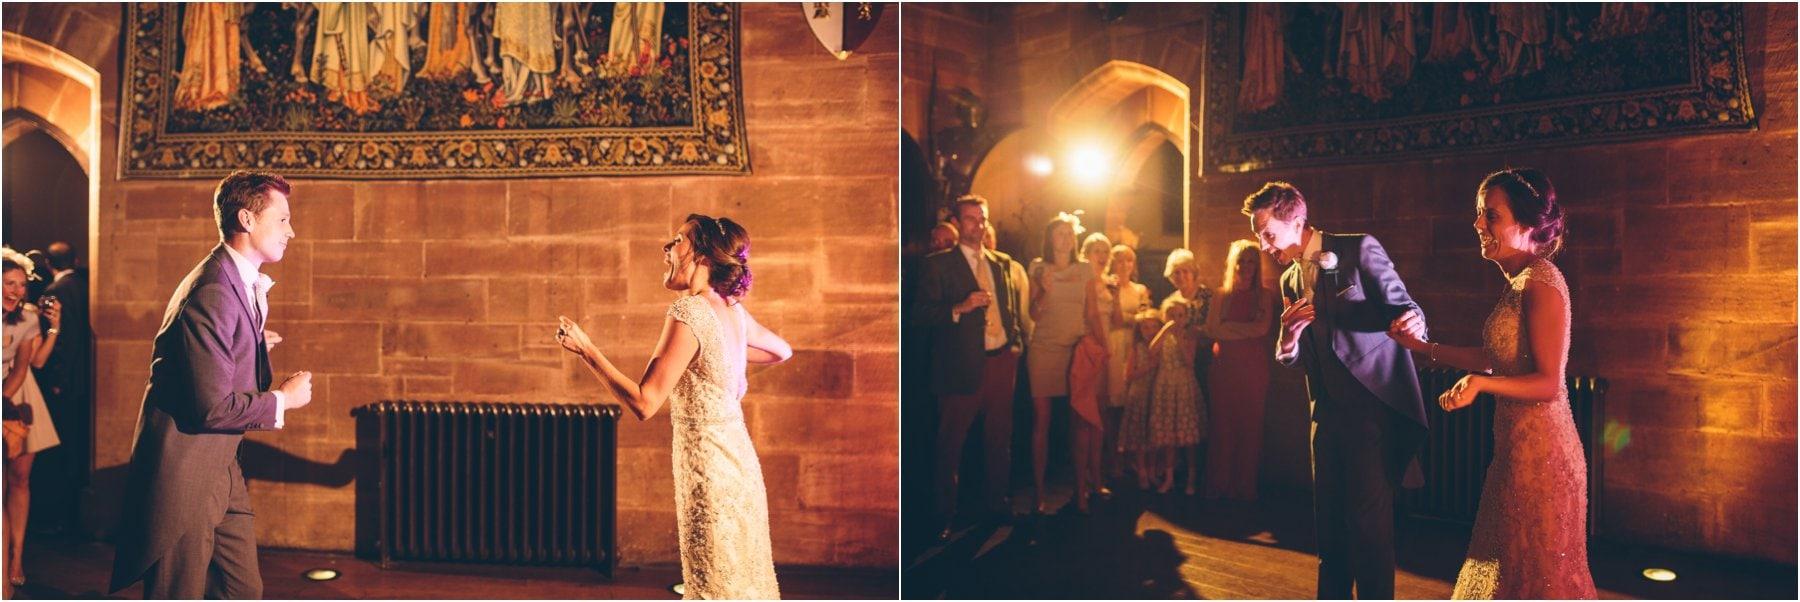 Peckforton_Castle_Wedding_Photography_0086